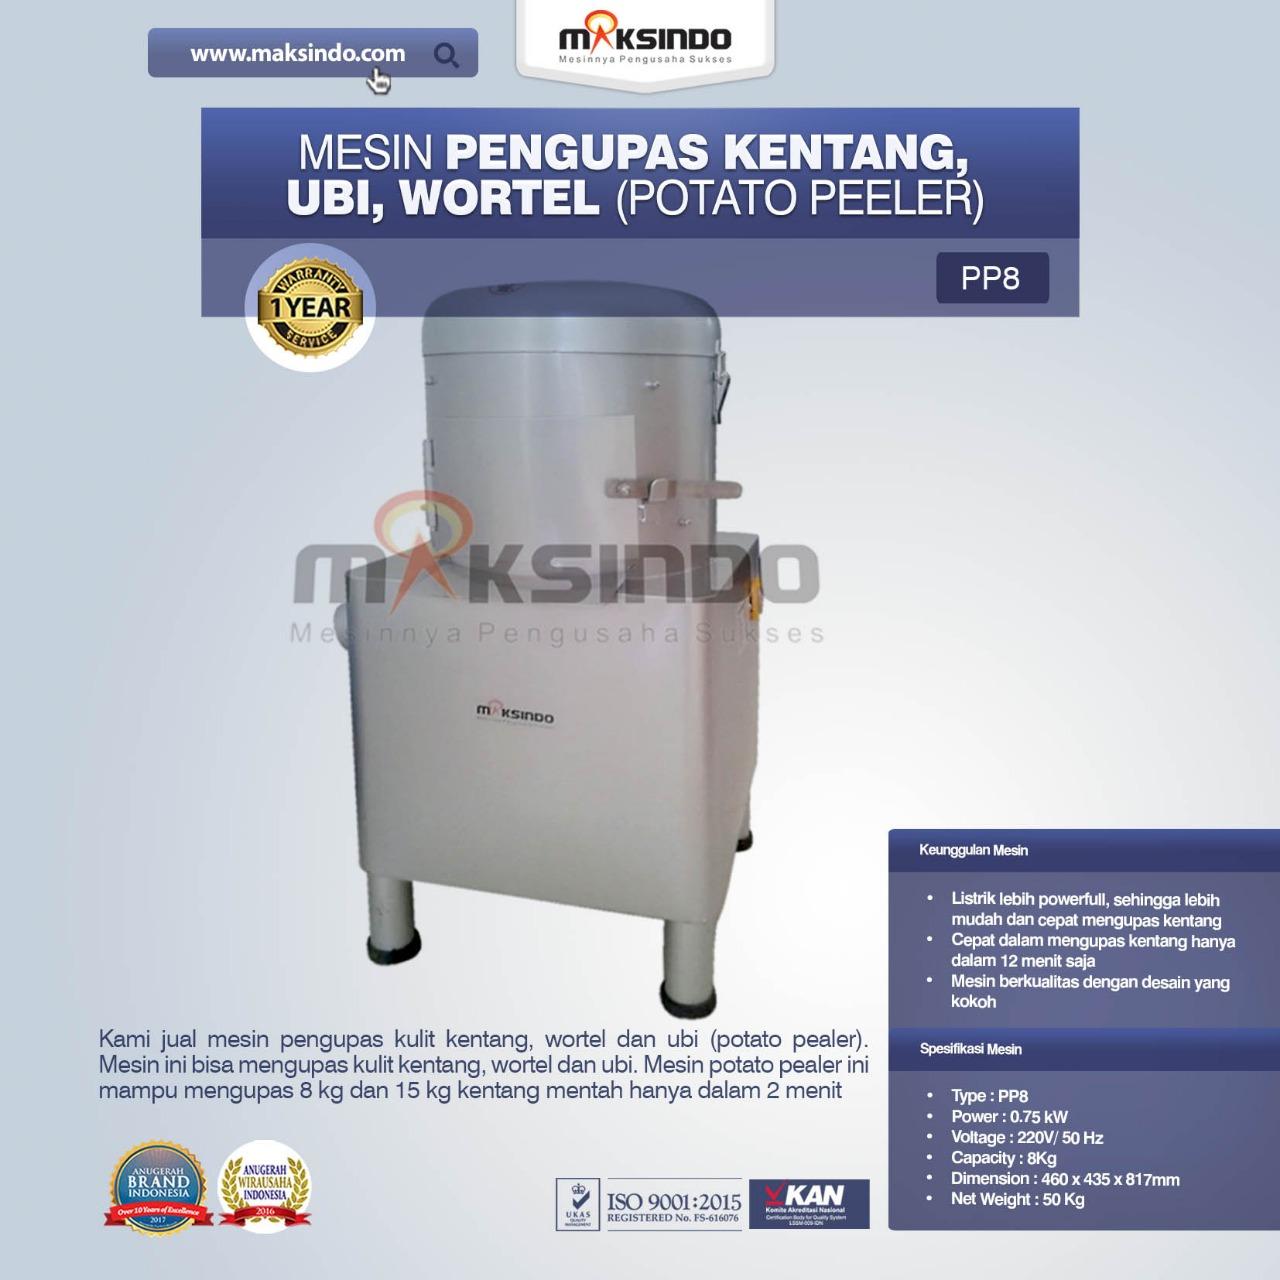 Jual Mesin Pengupas Kentang, Ubi, Wortel (Potato Peeler) di Pekanbaru